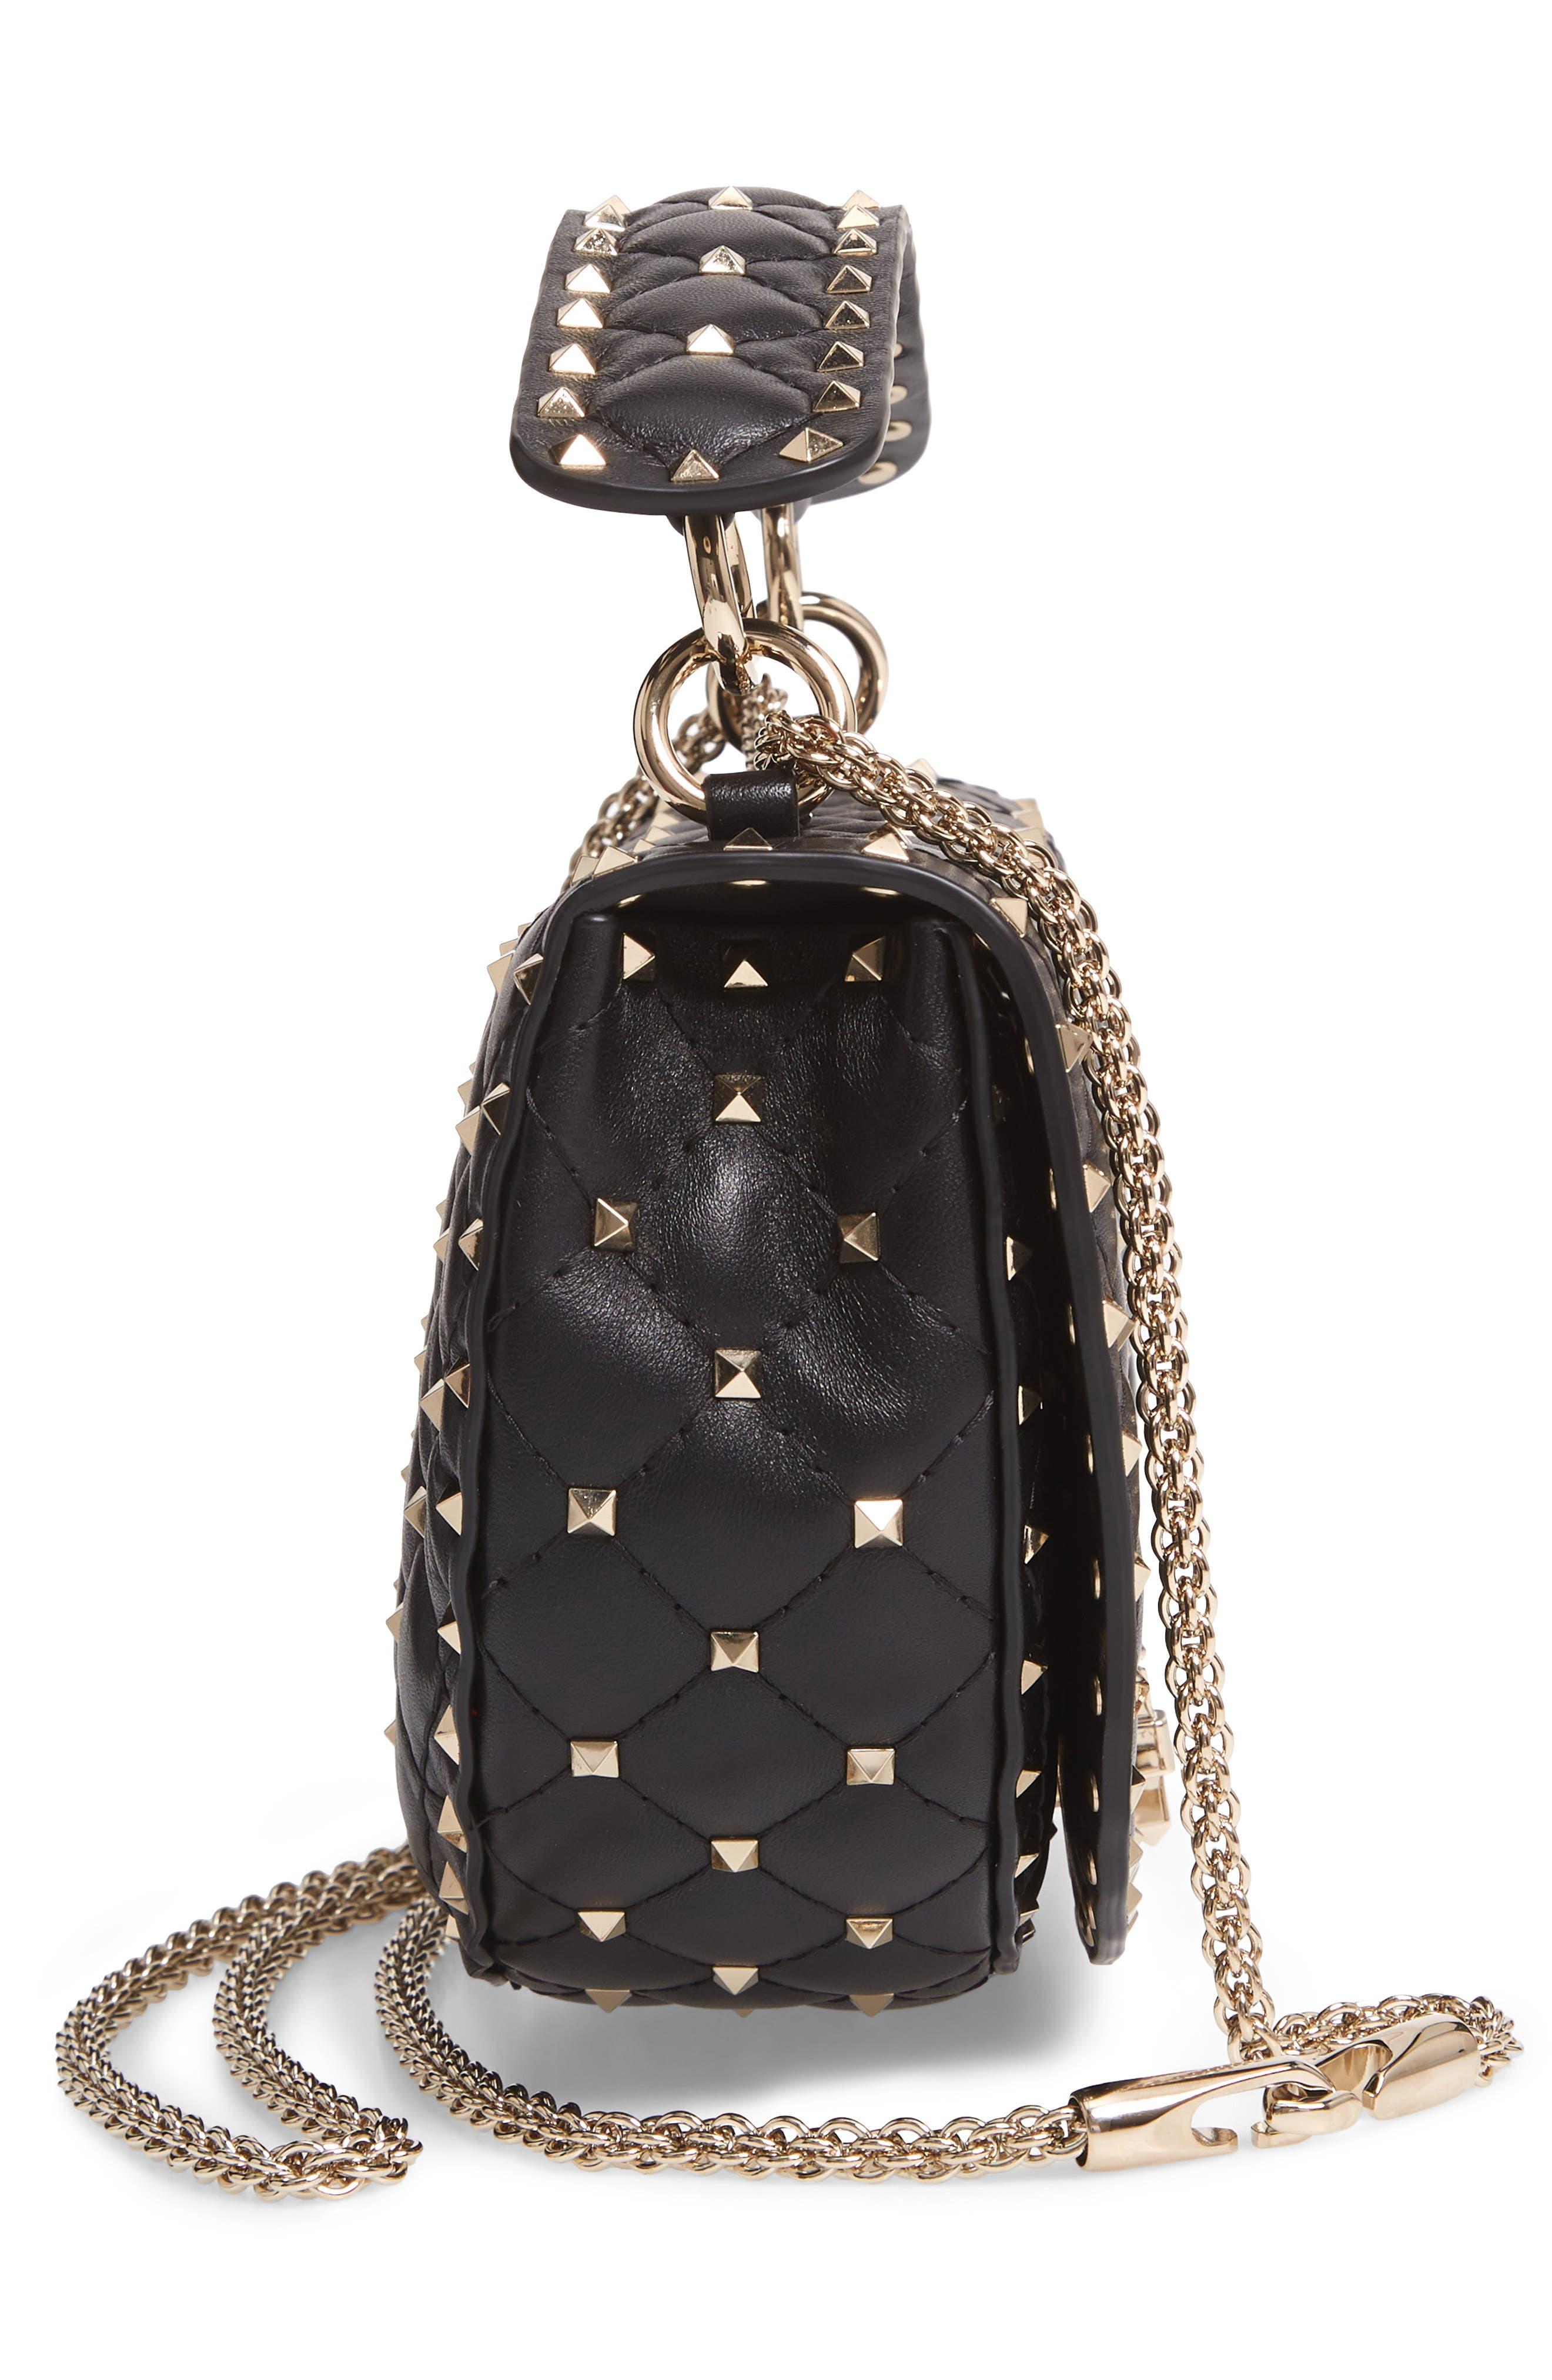 VALENTINO GARAVANI, Rockstud Spike Leather Saddle Bag, Alternate thumbnail 5, color, NERO